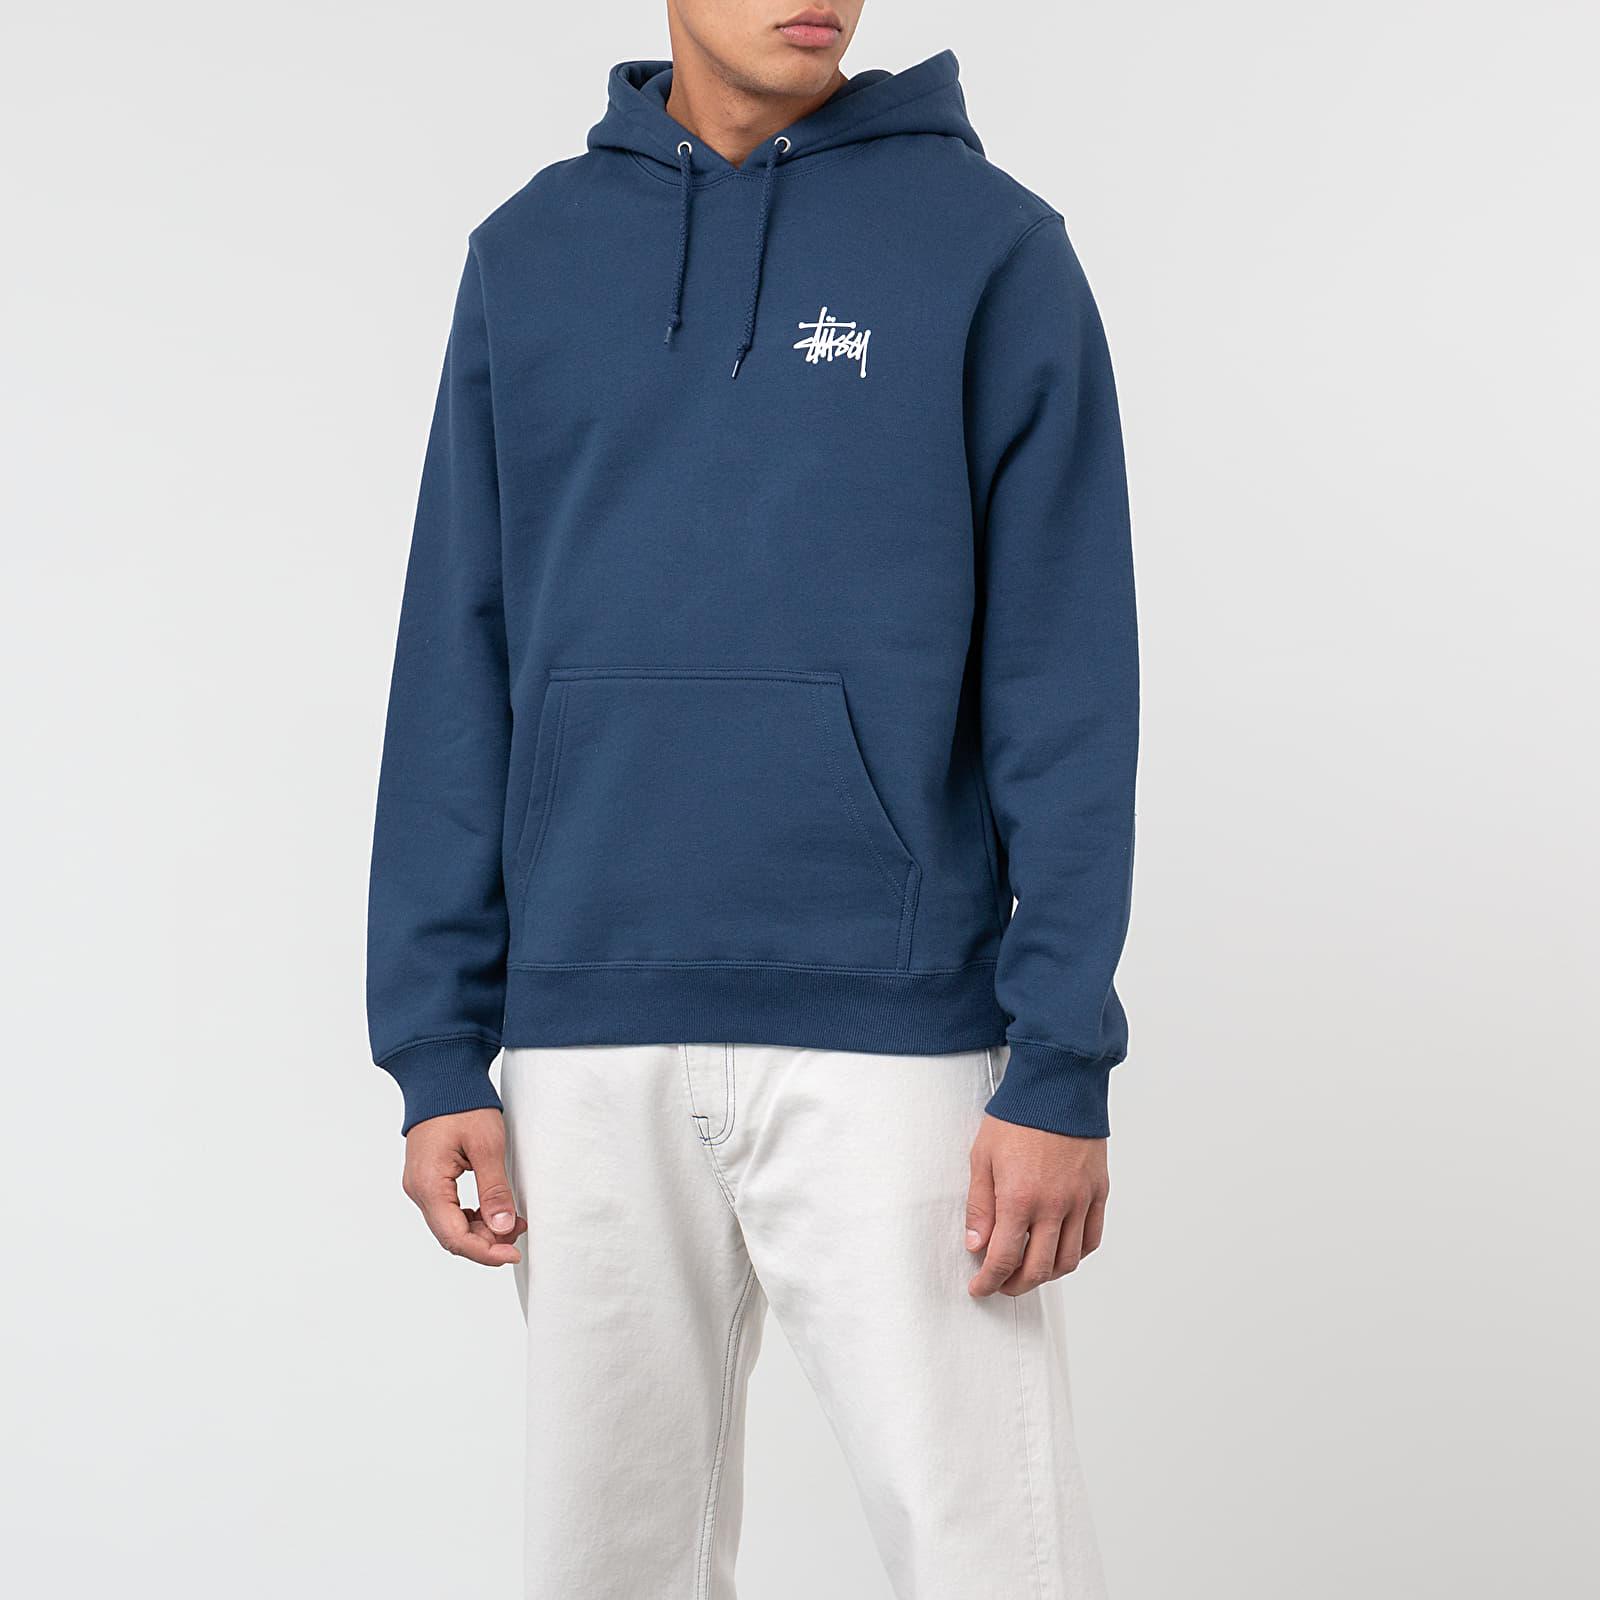 stüssy sweatshirt herren